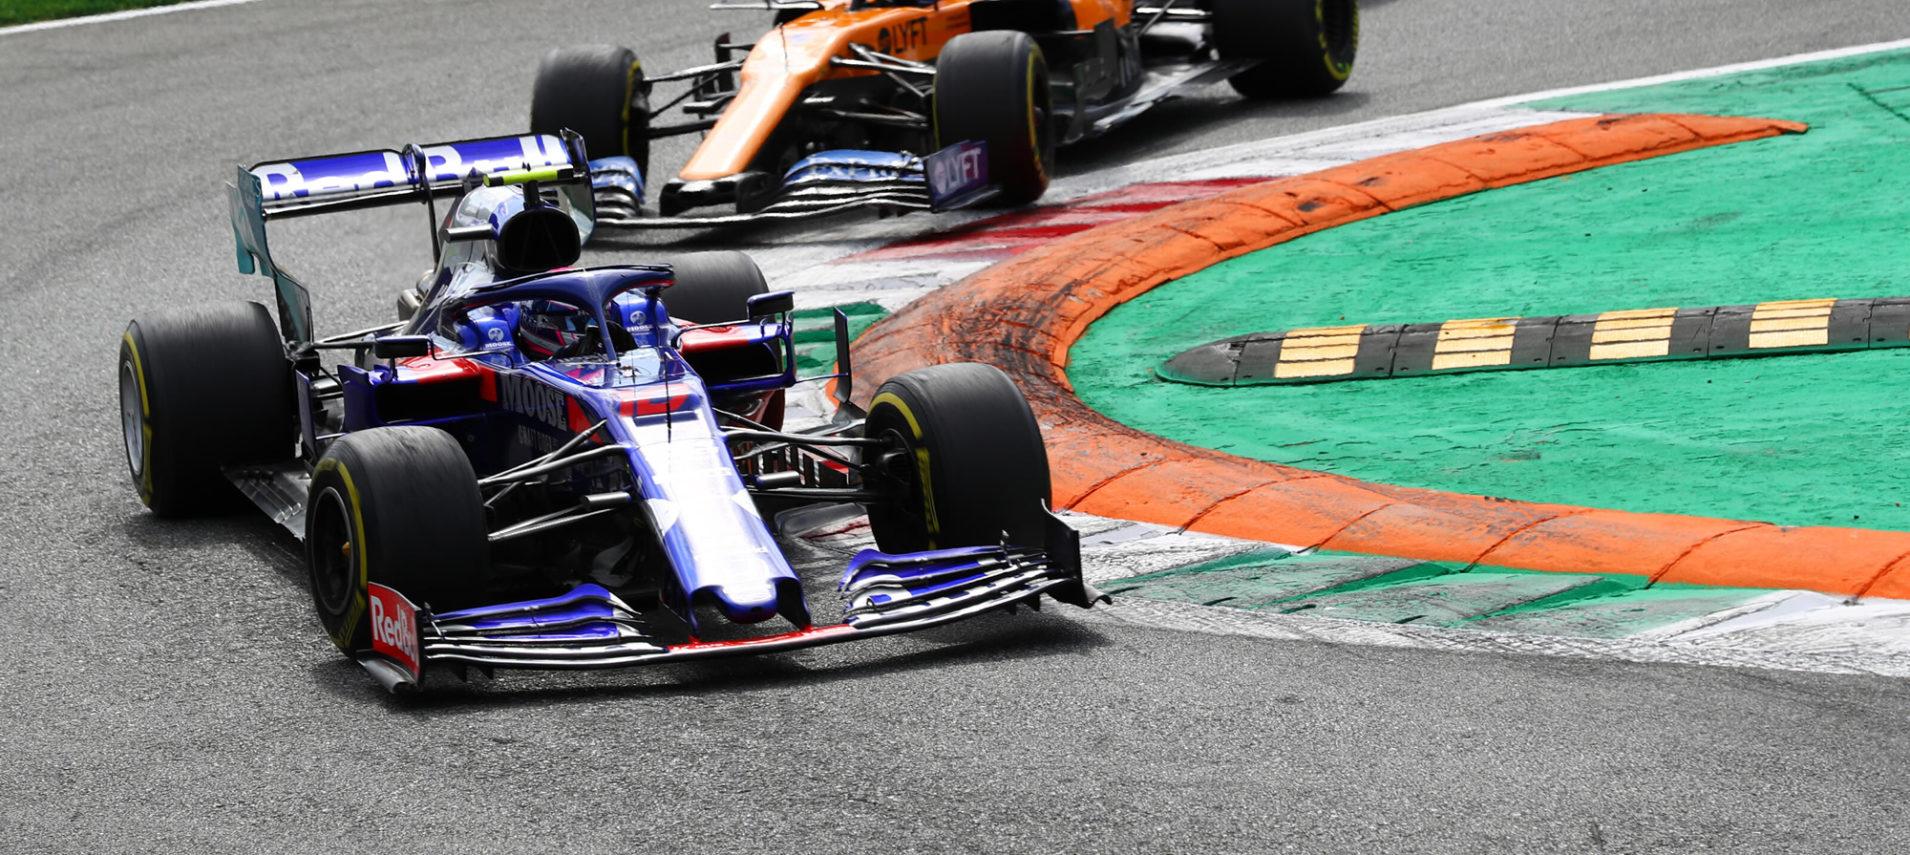 Italian GP 2019 – Gallery 2